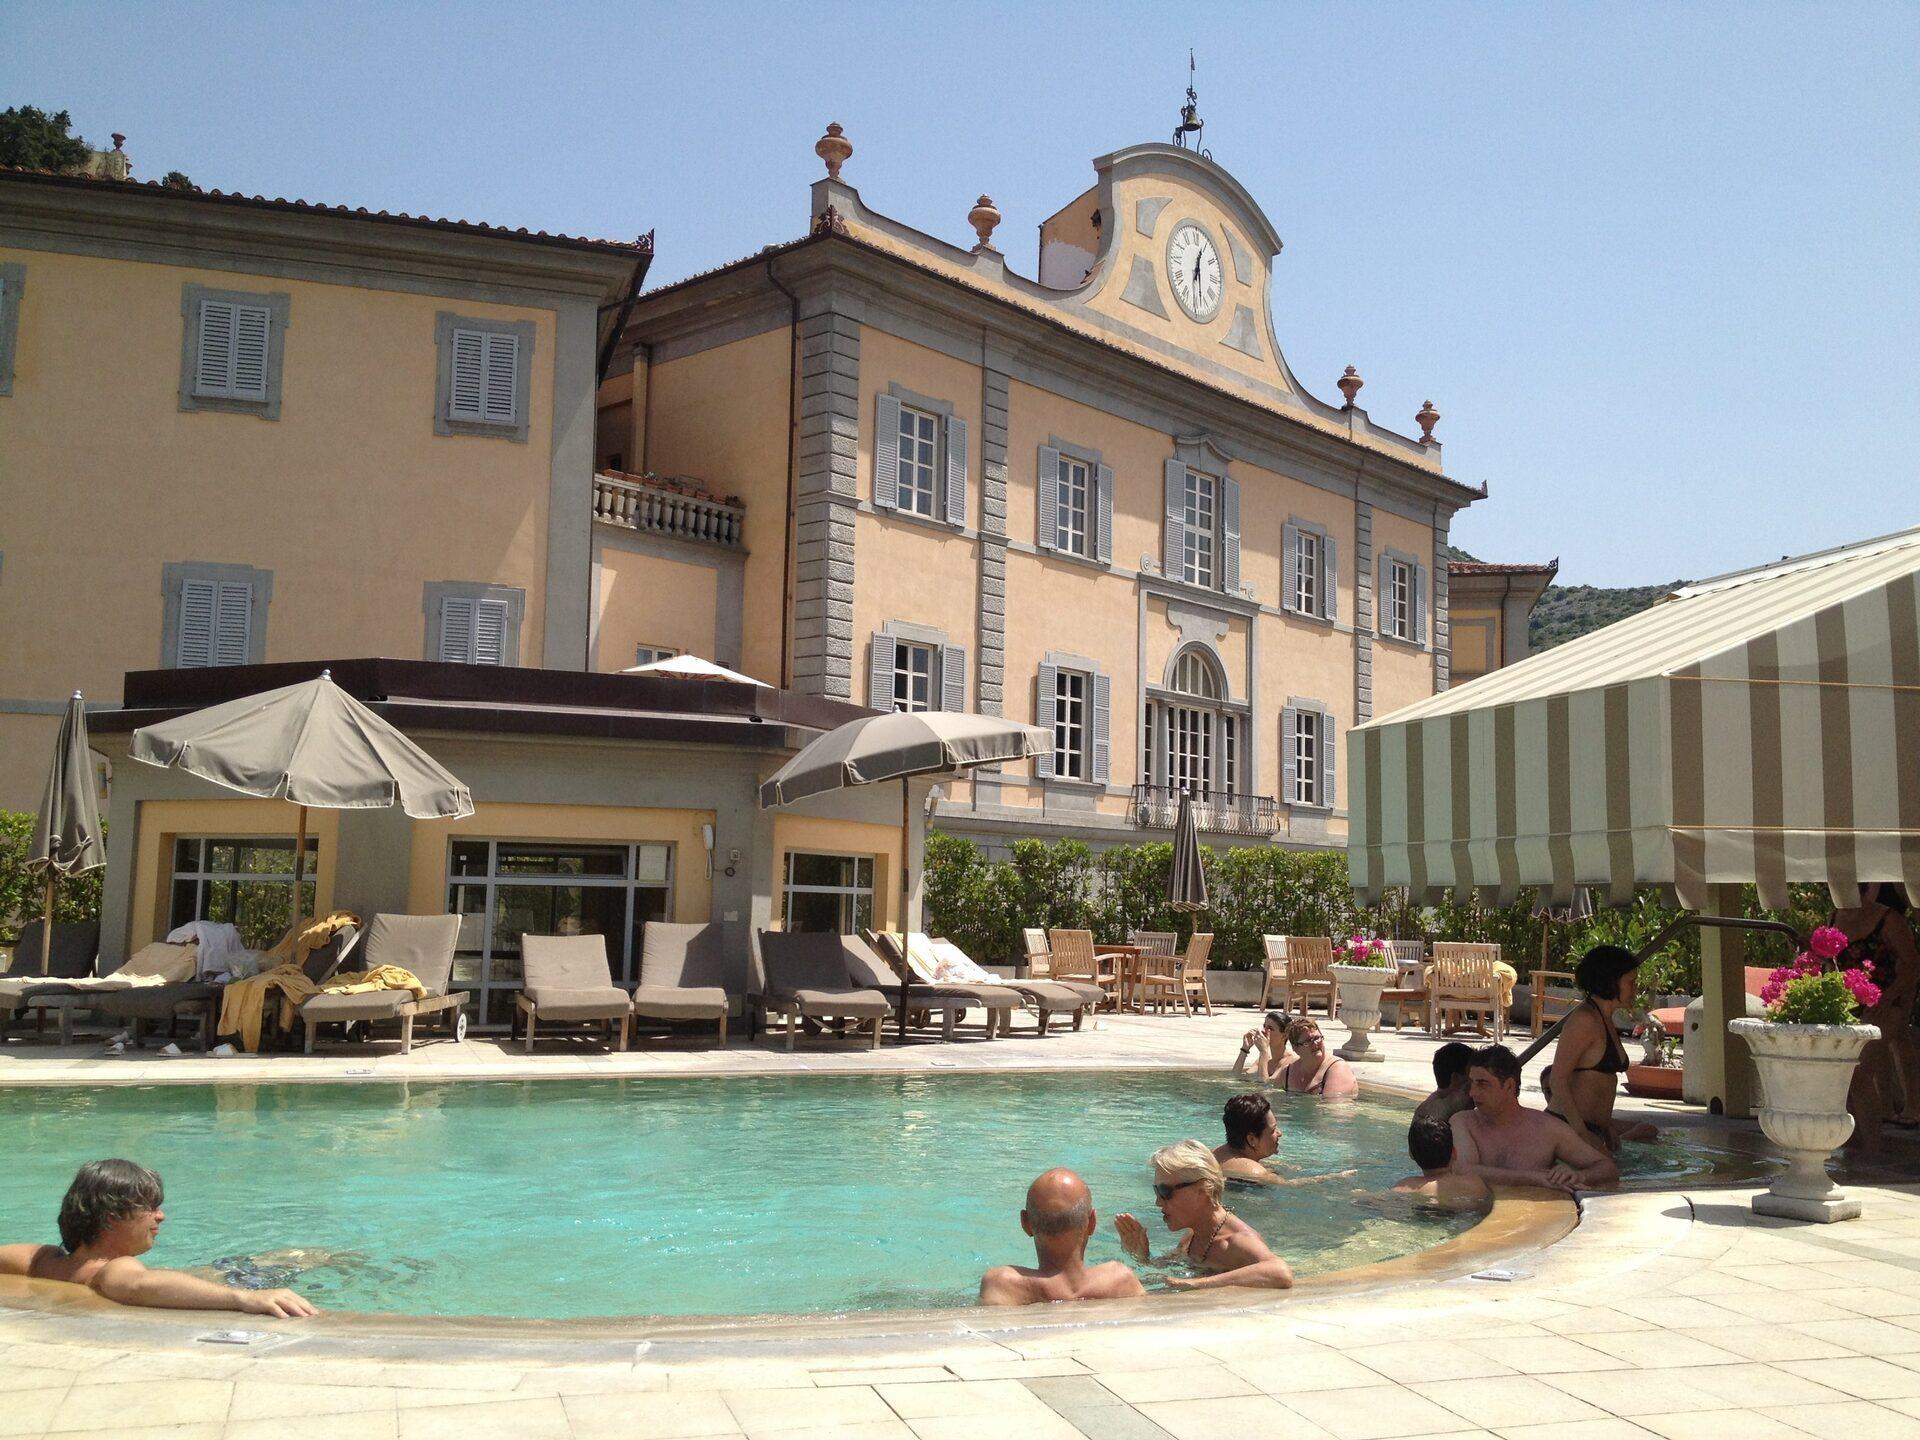 Bagno Balena Marina Di Pisa : Bagno balena marina di pisa prezzi ~ idee di design per la casa